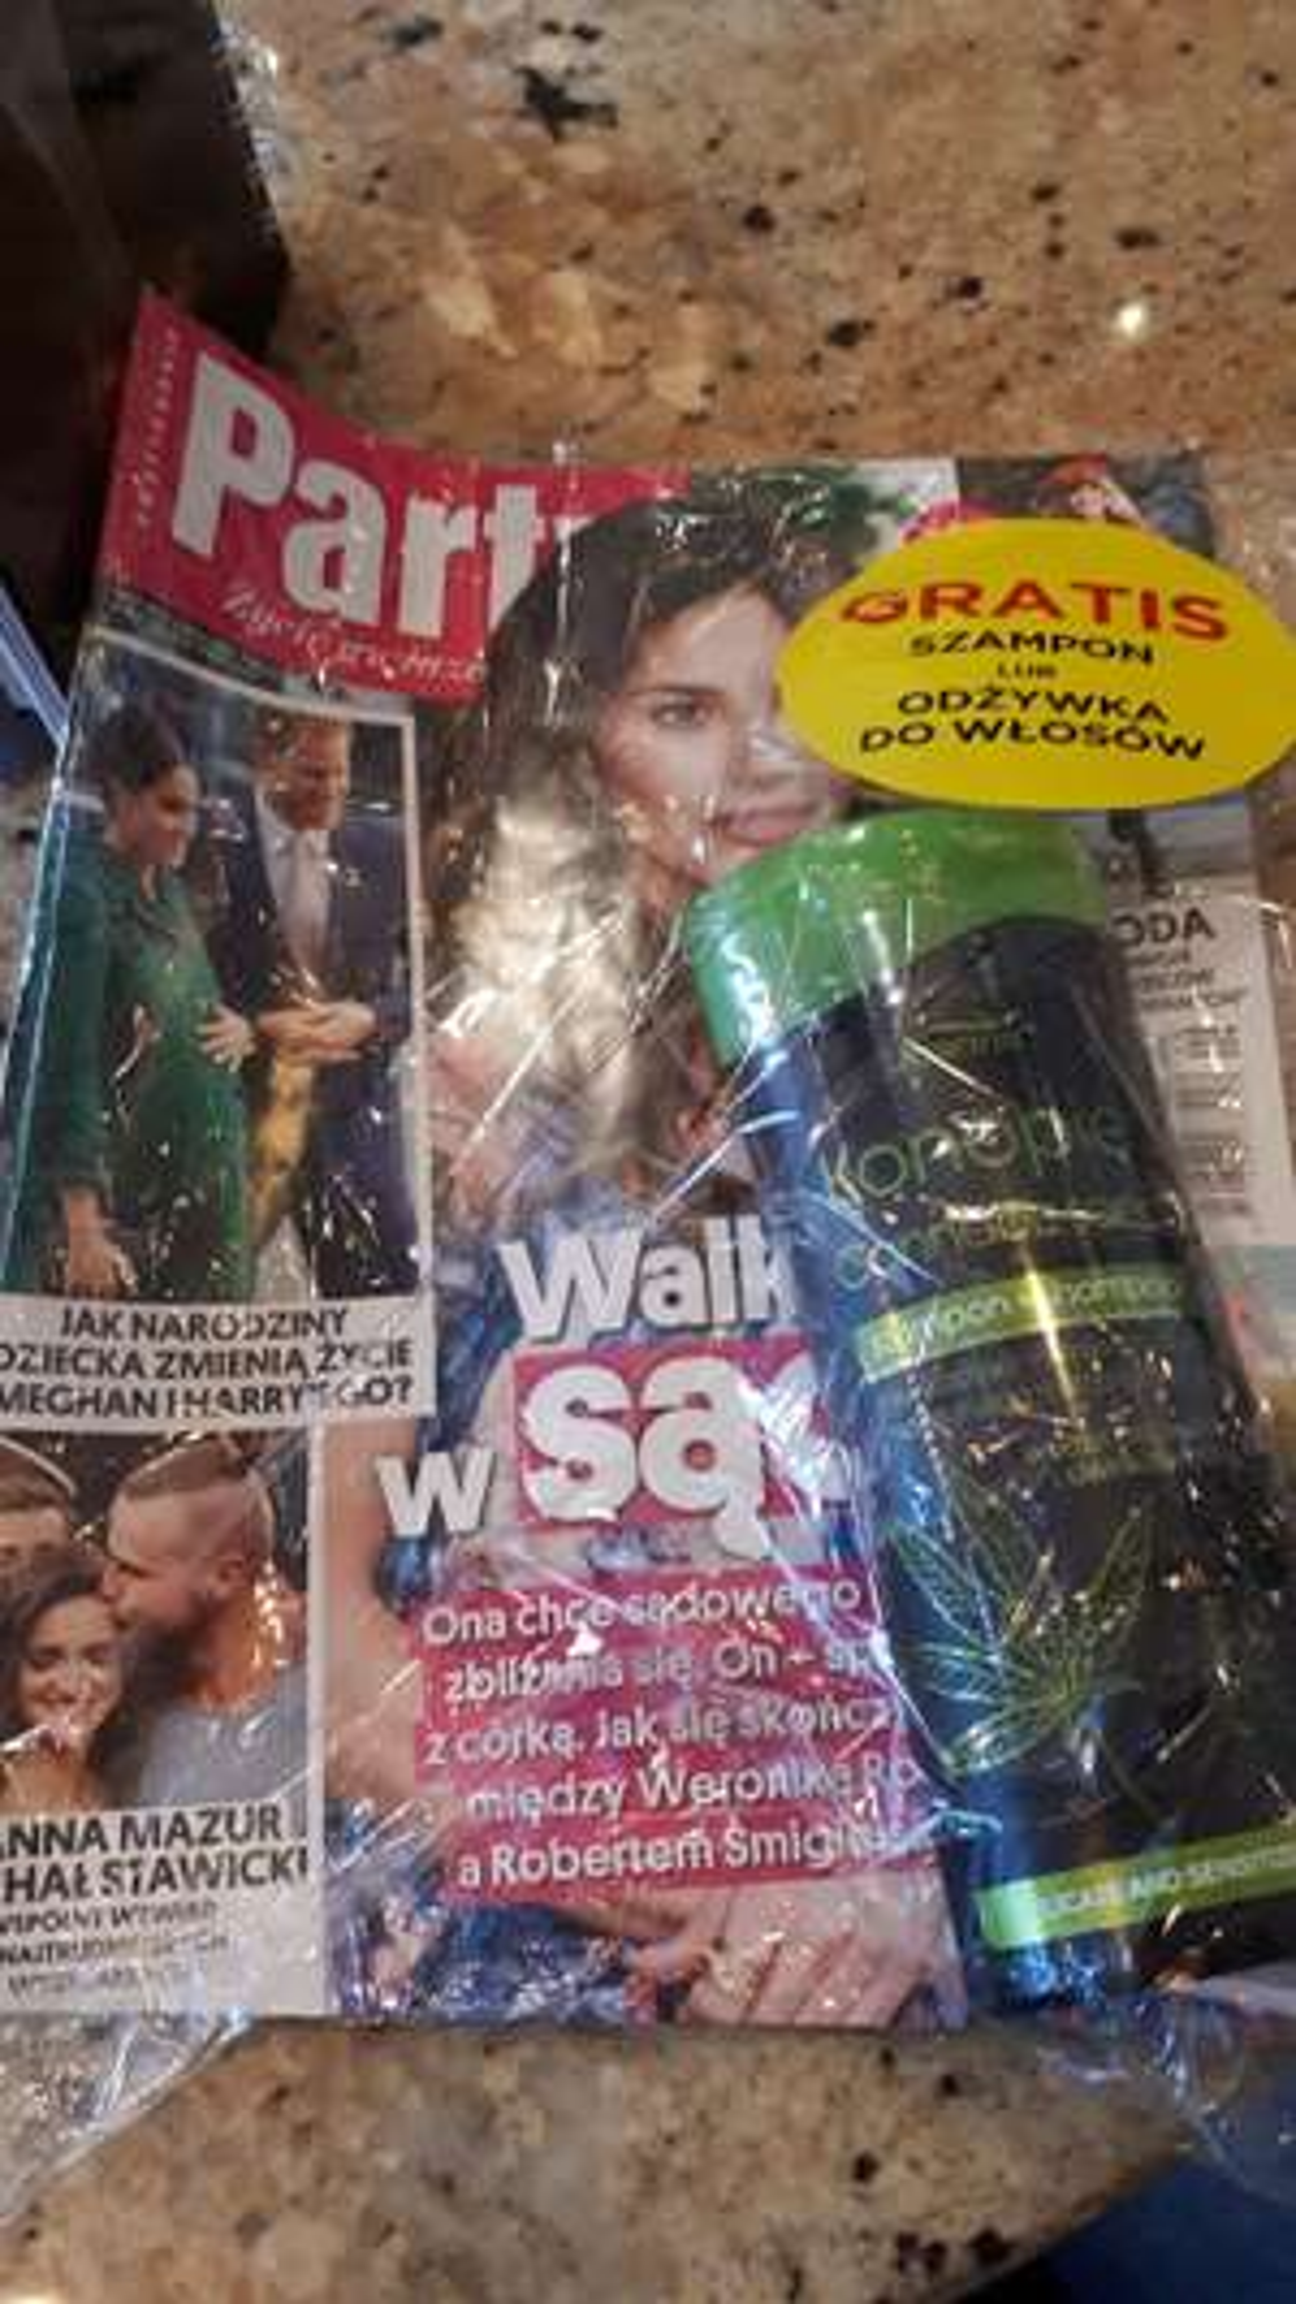 Gazeta party z szamponem joanna za 3.21